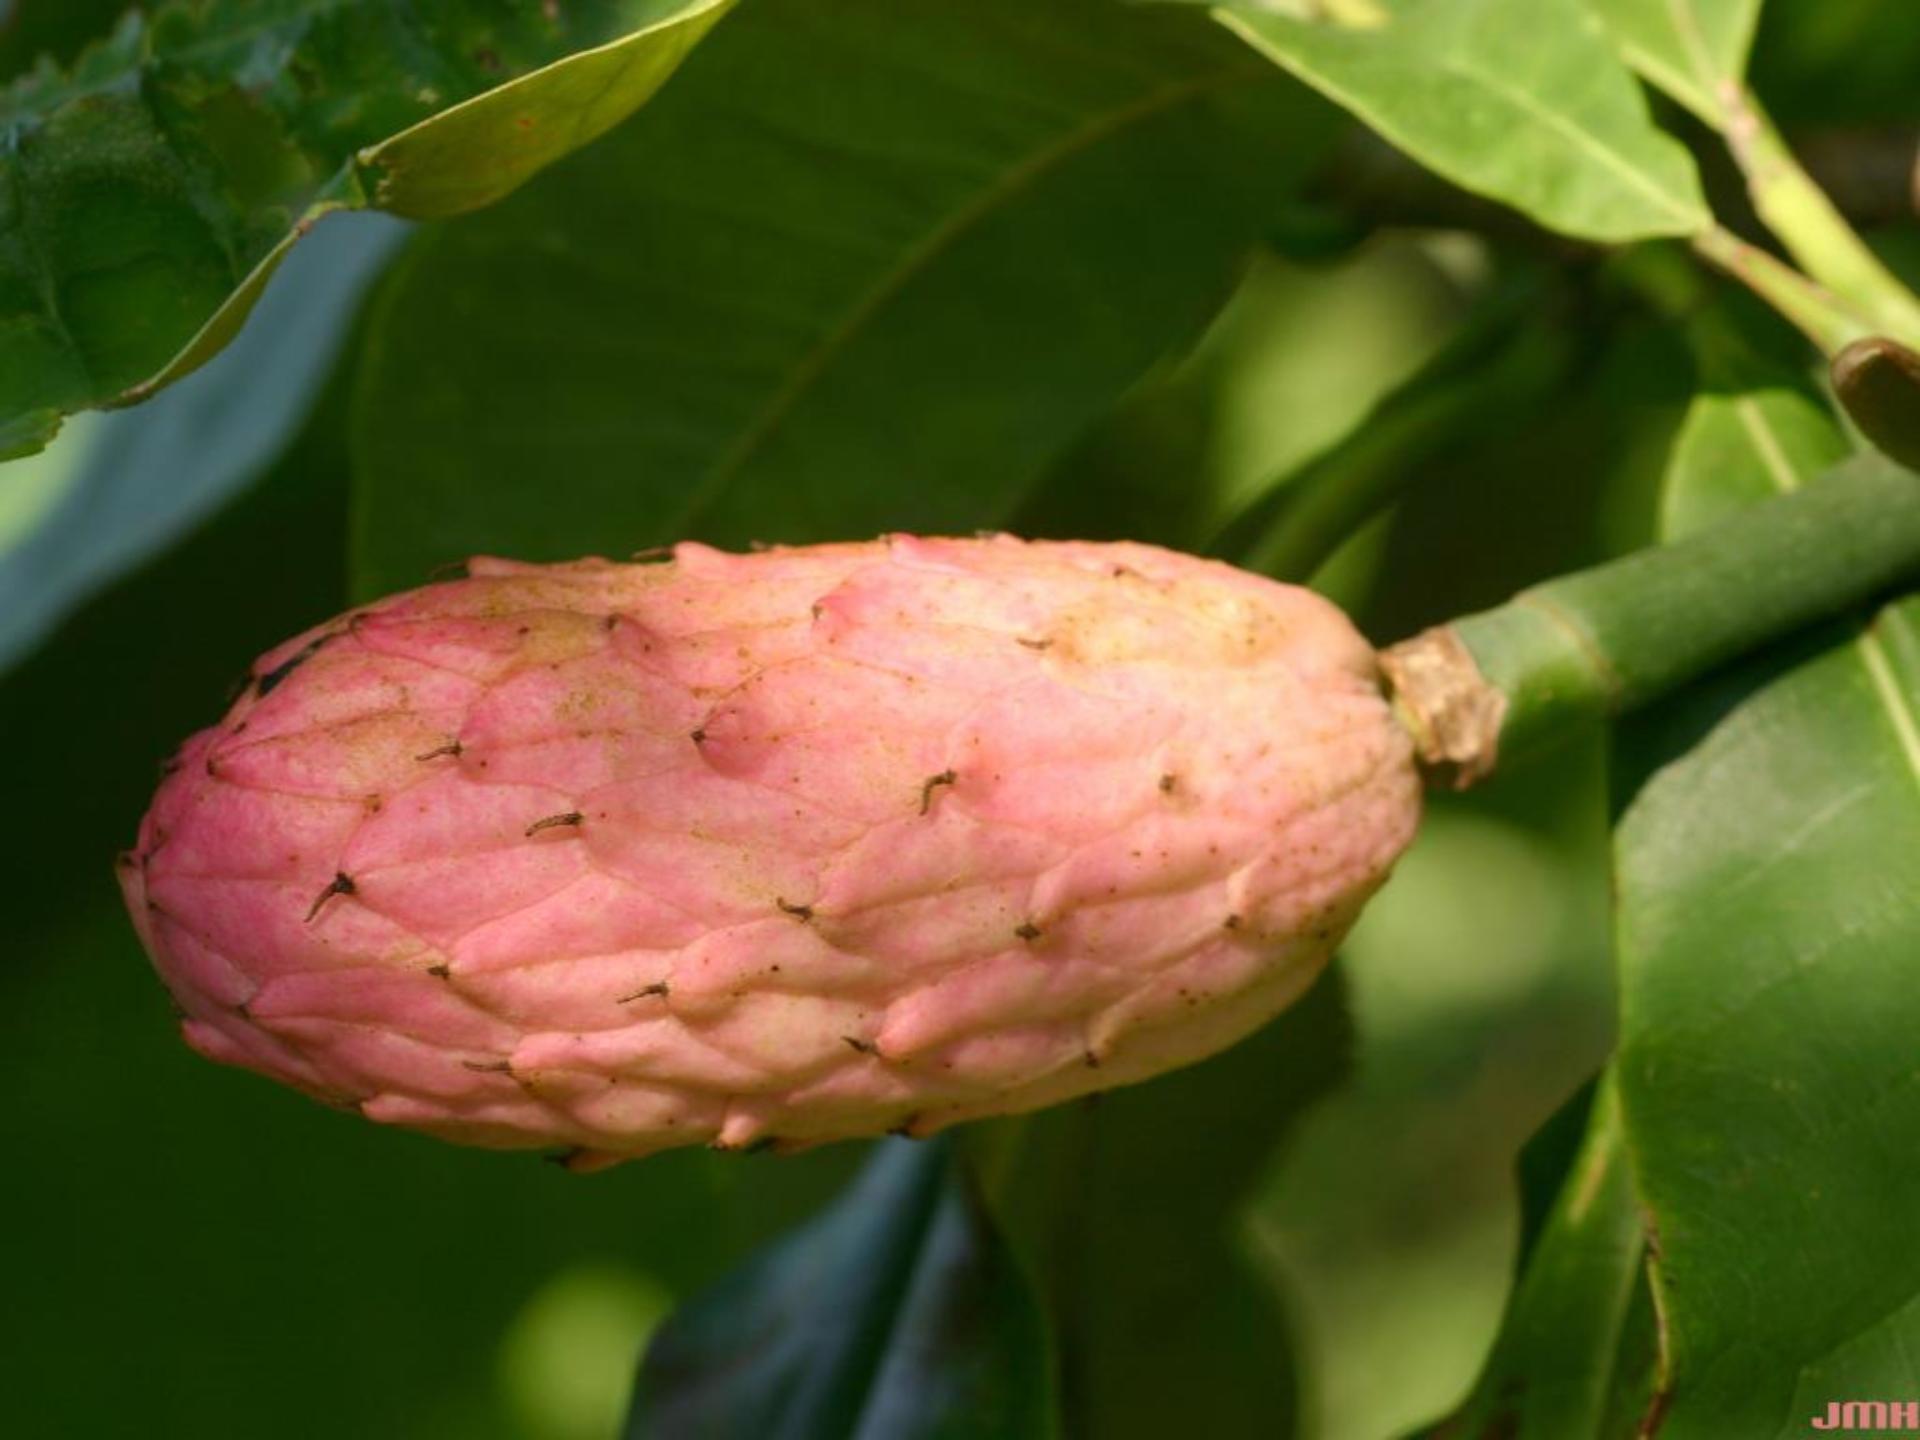 Magnolia tripetala L. (umbrella magnolia), fruit